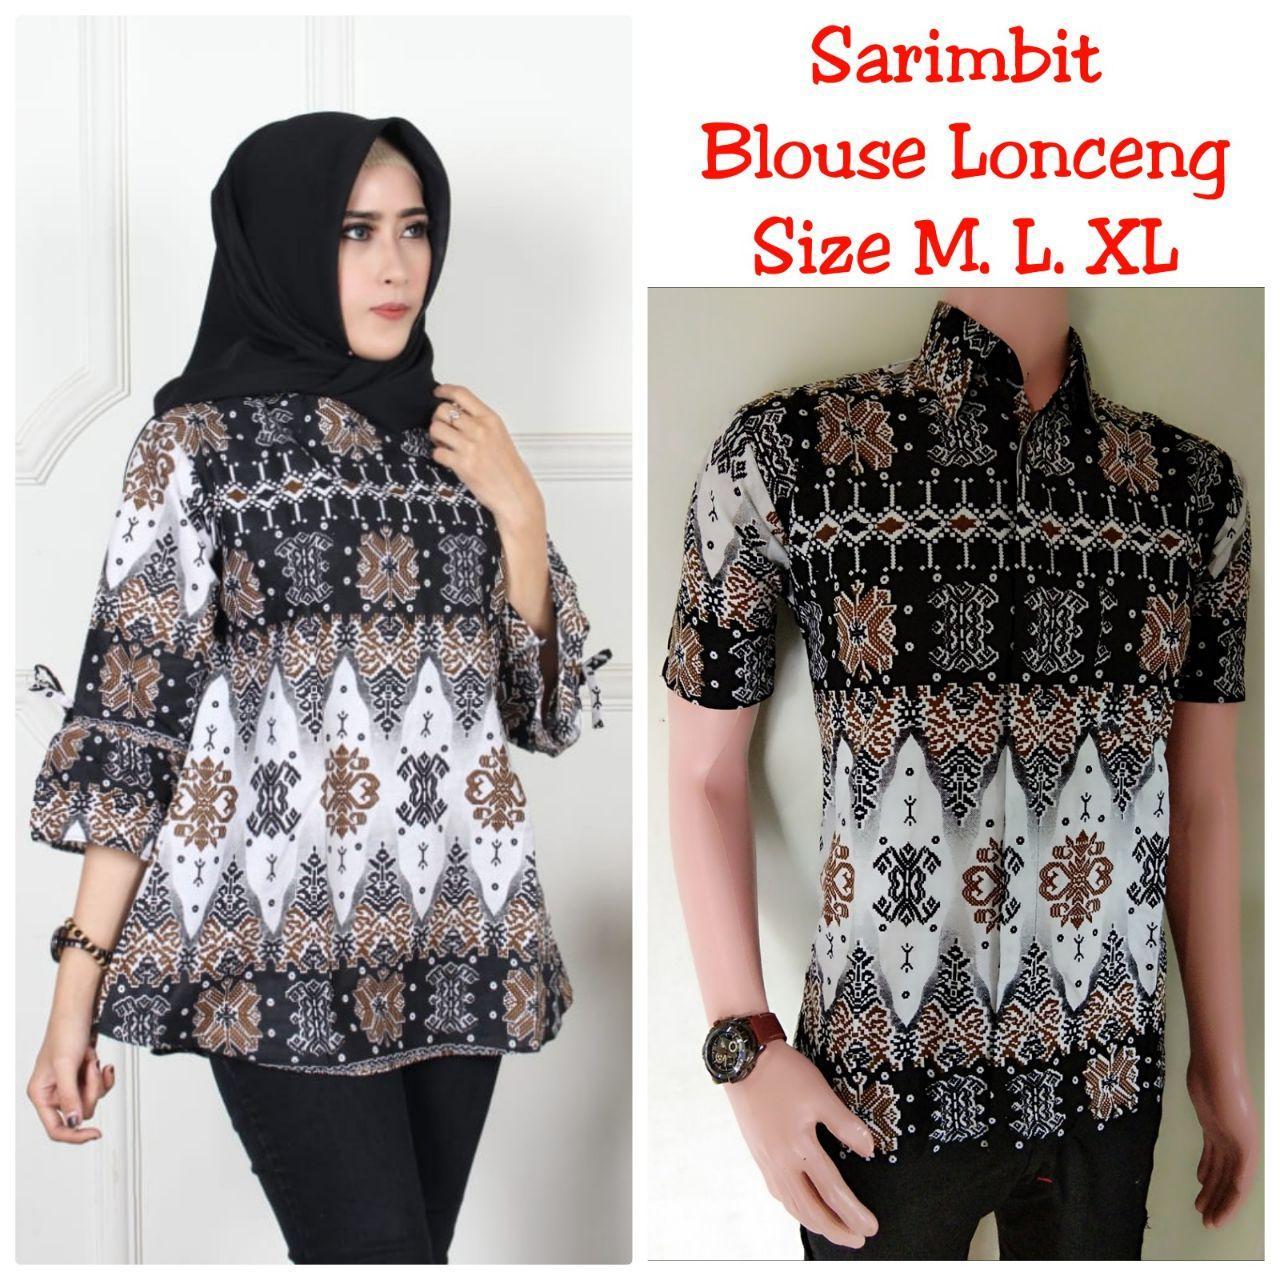 Rp165.000TERMURAH - Couple Batik / Sarimbit Batik / Batik Couple / Sarimbit /Baju Batik Couple / Atasan Batik / Seragam Batik / Blouse / Kemeja Batik / Baju ...